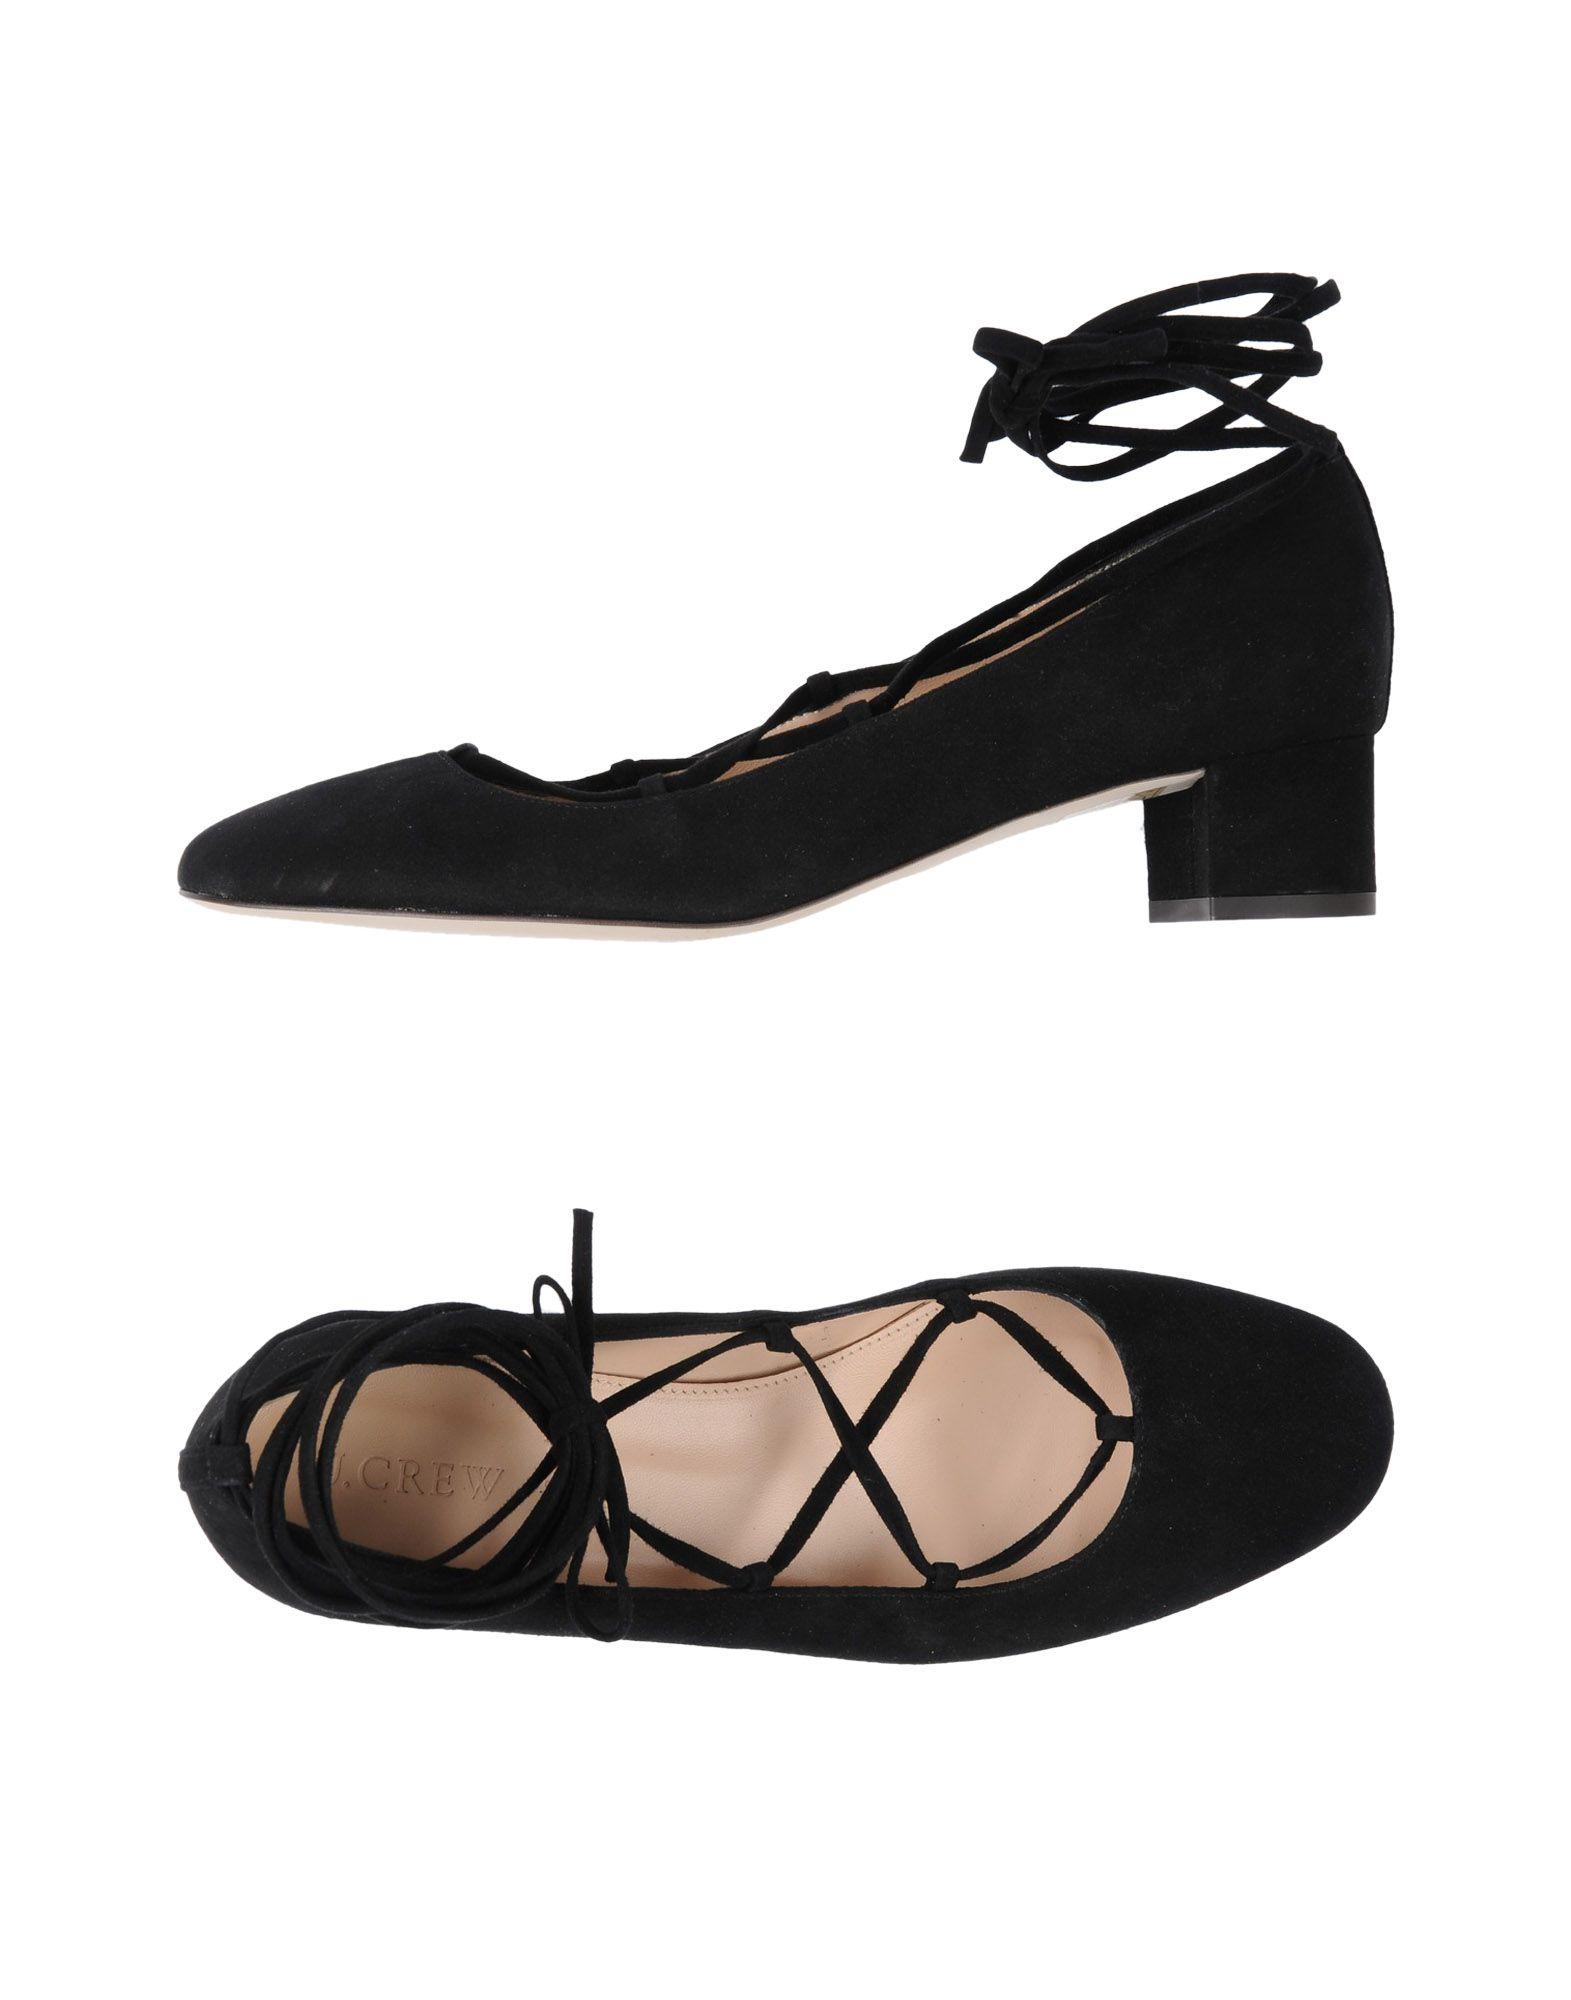 Stilvolle billige Schuhe Damen J.Crew Pumps Damen Schuhe  38735342LQ 5b73a3